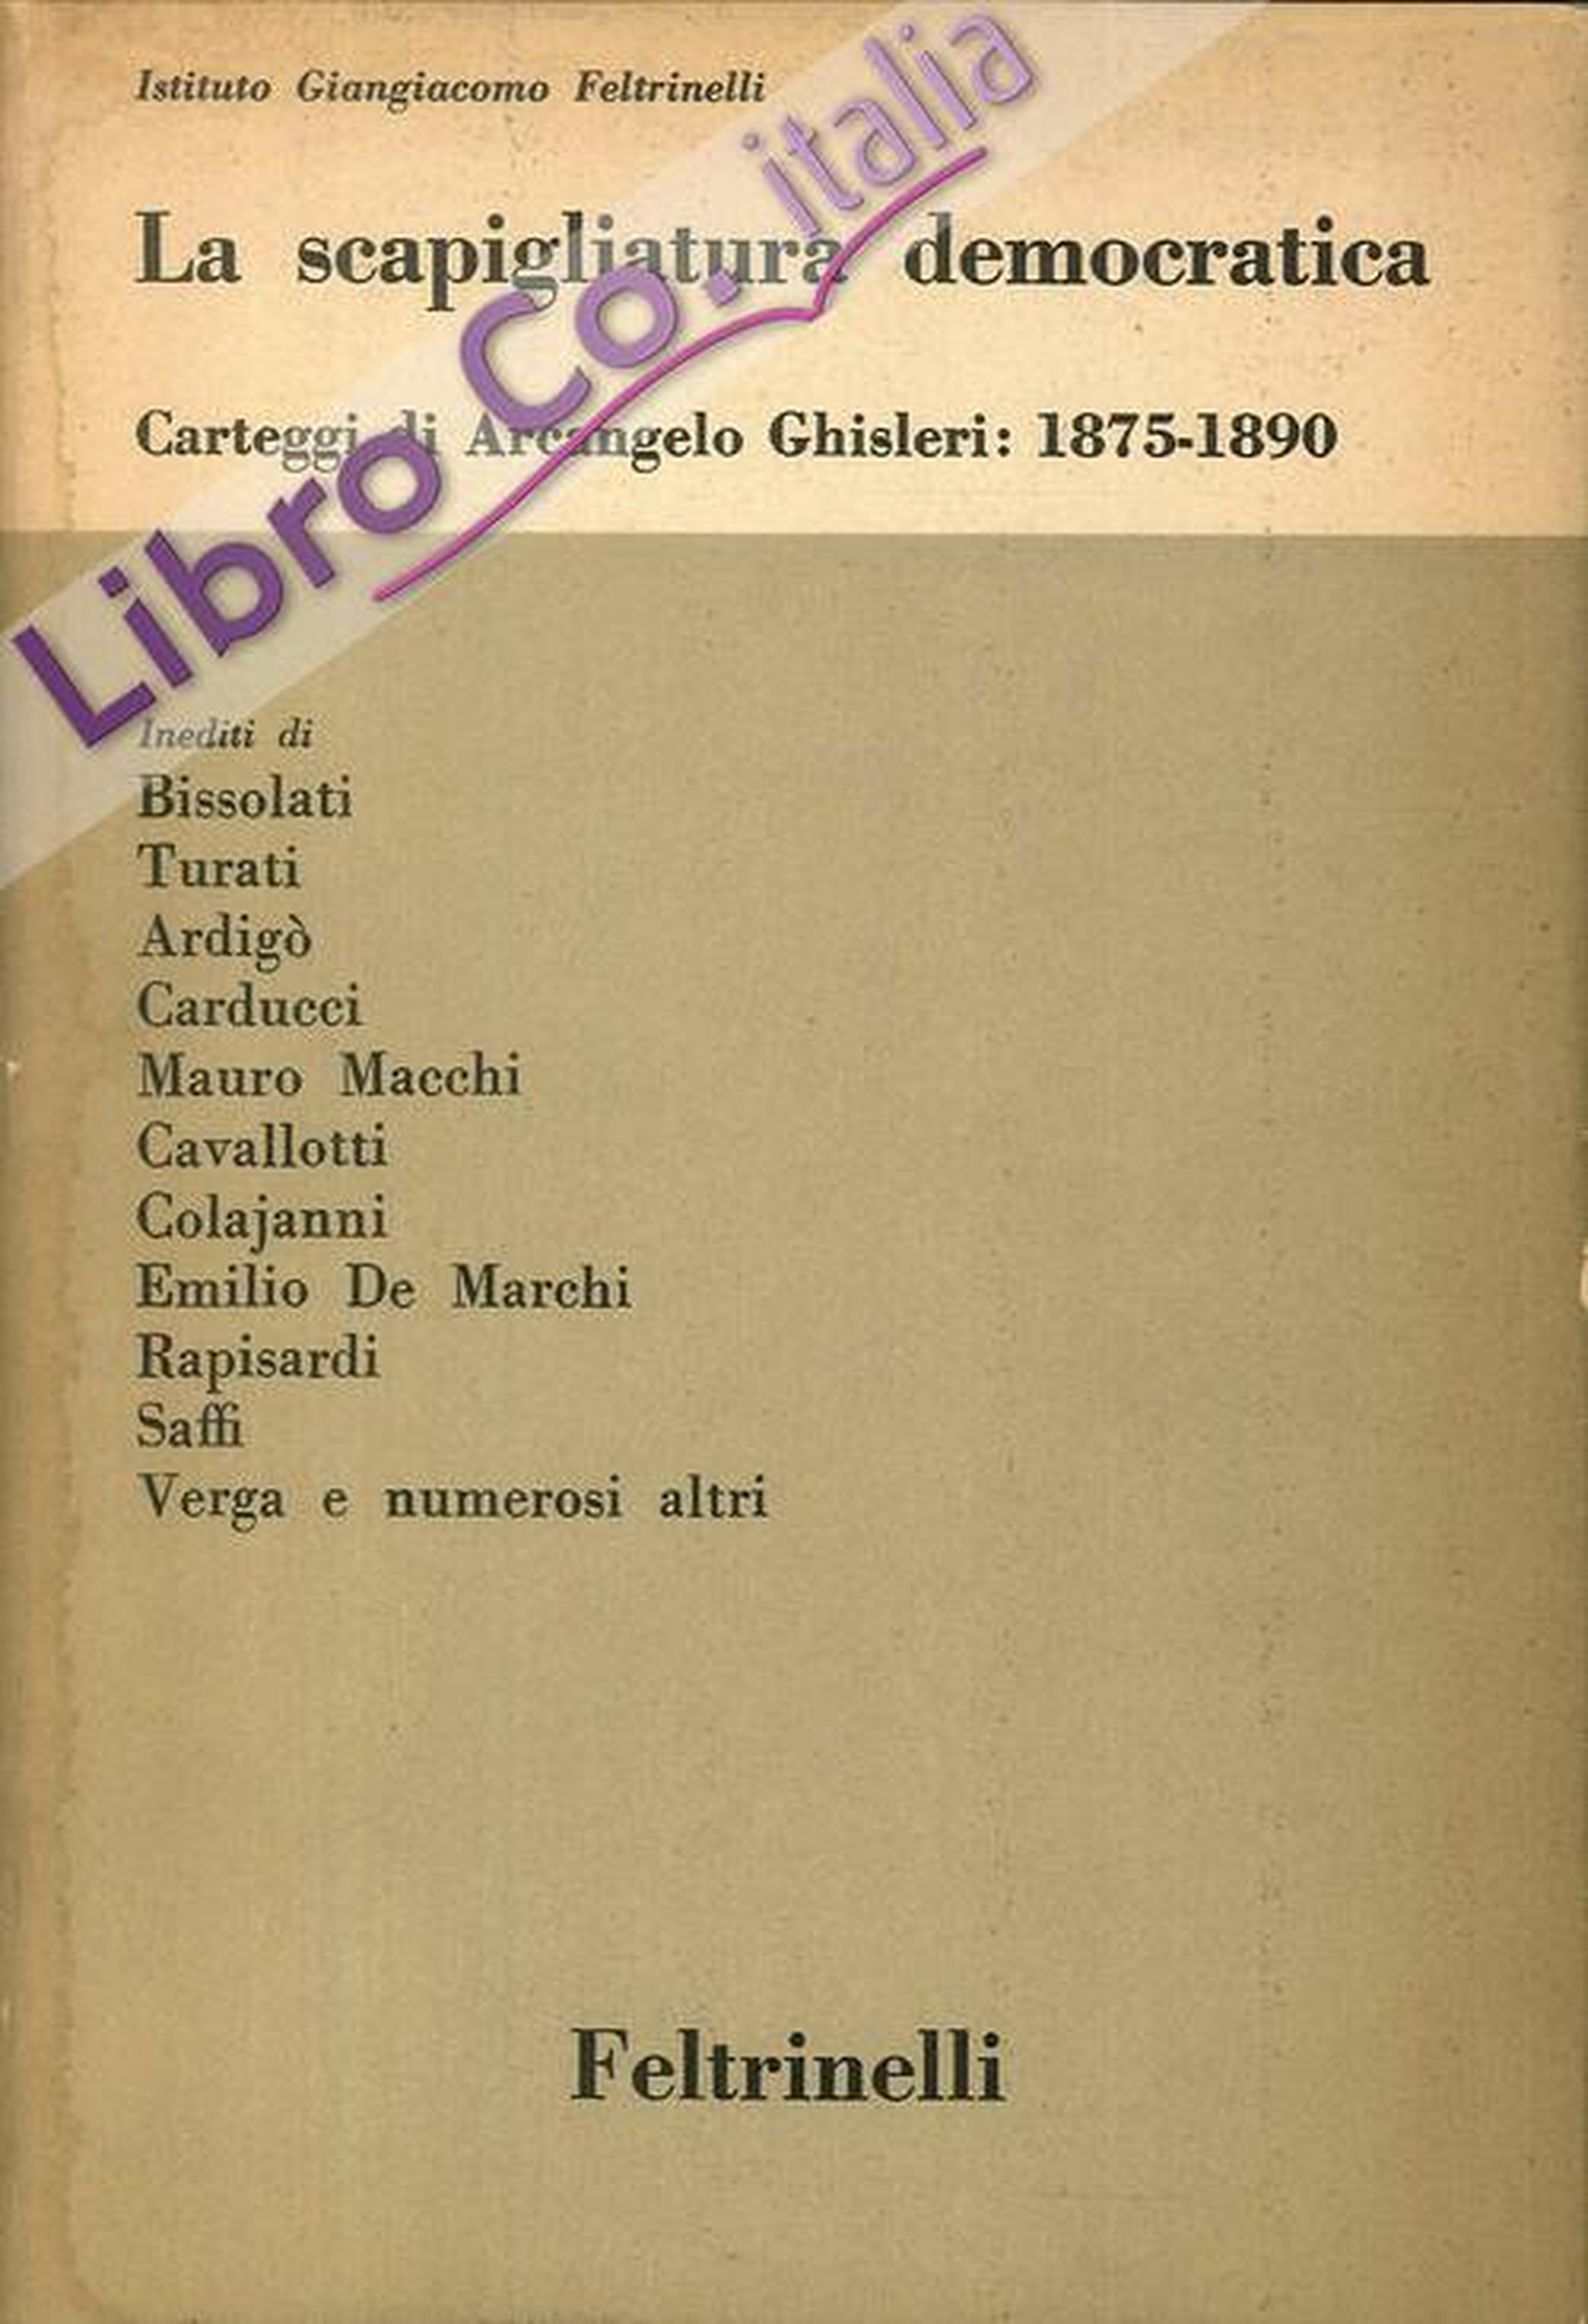 La Scapigliatura Democratica. Carteggio di Arcangelo Ghisleri: 1875-1890